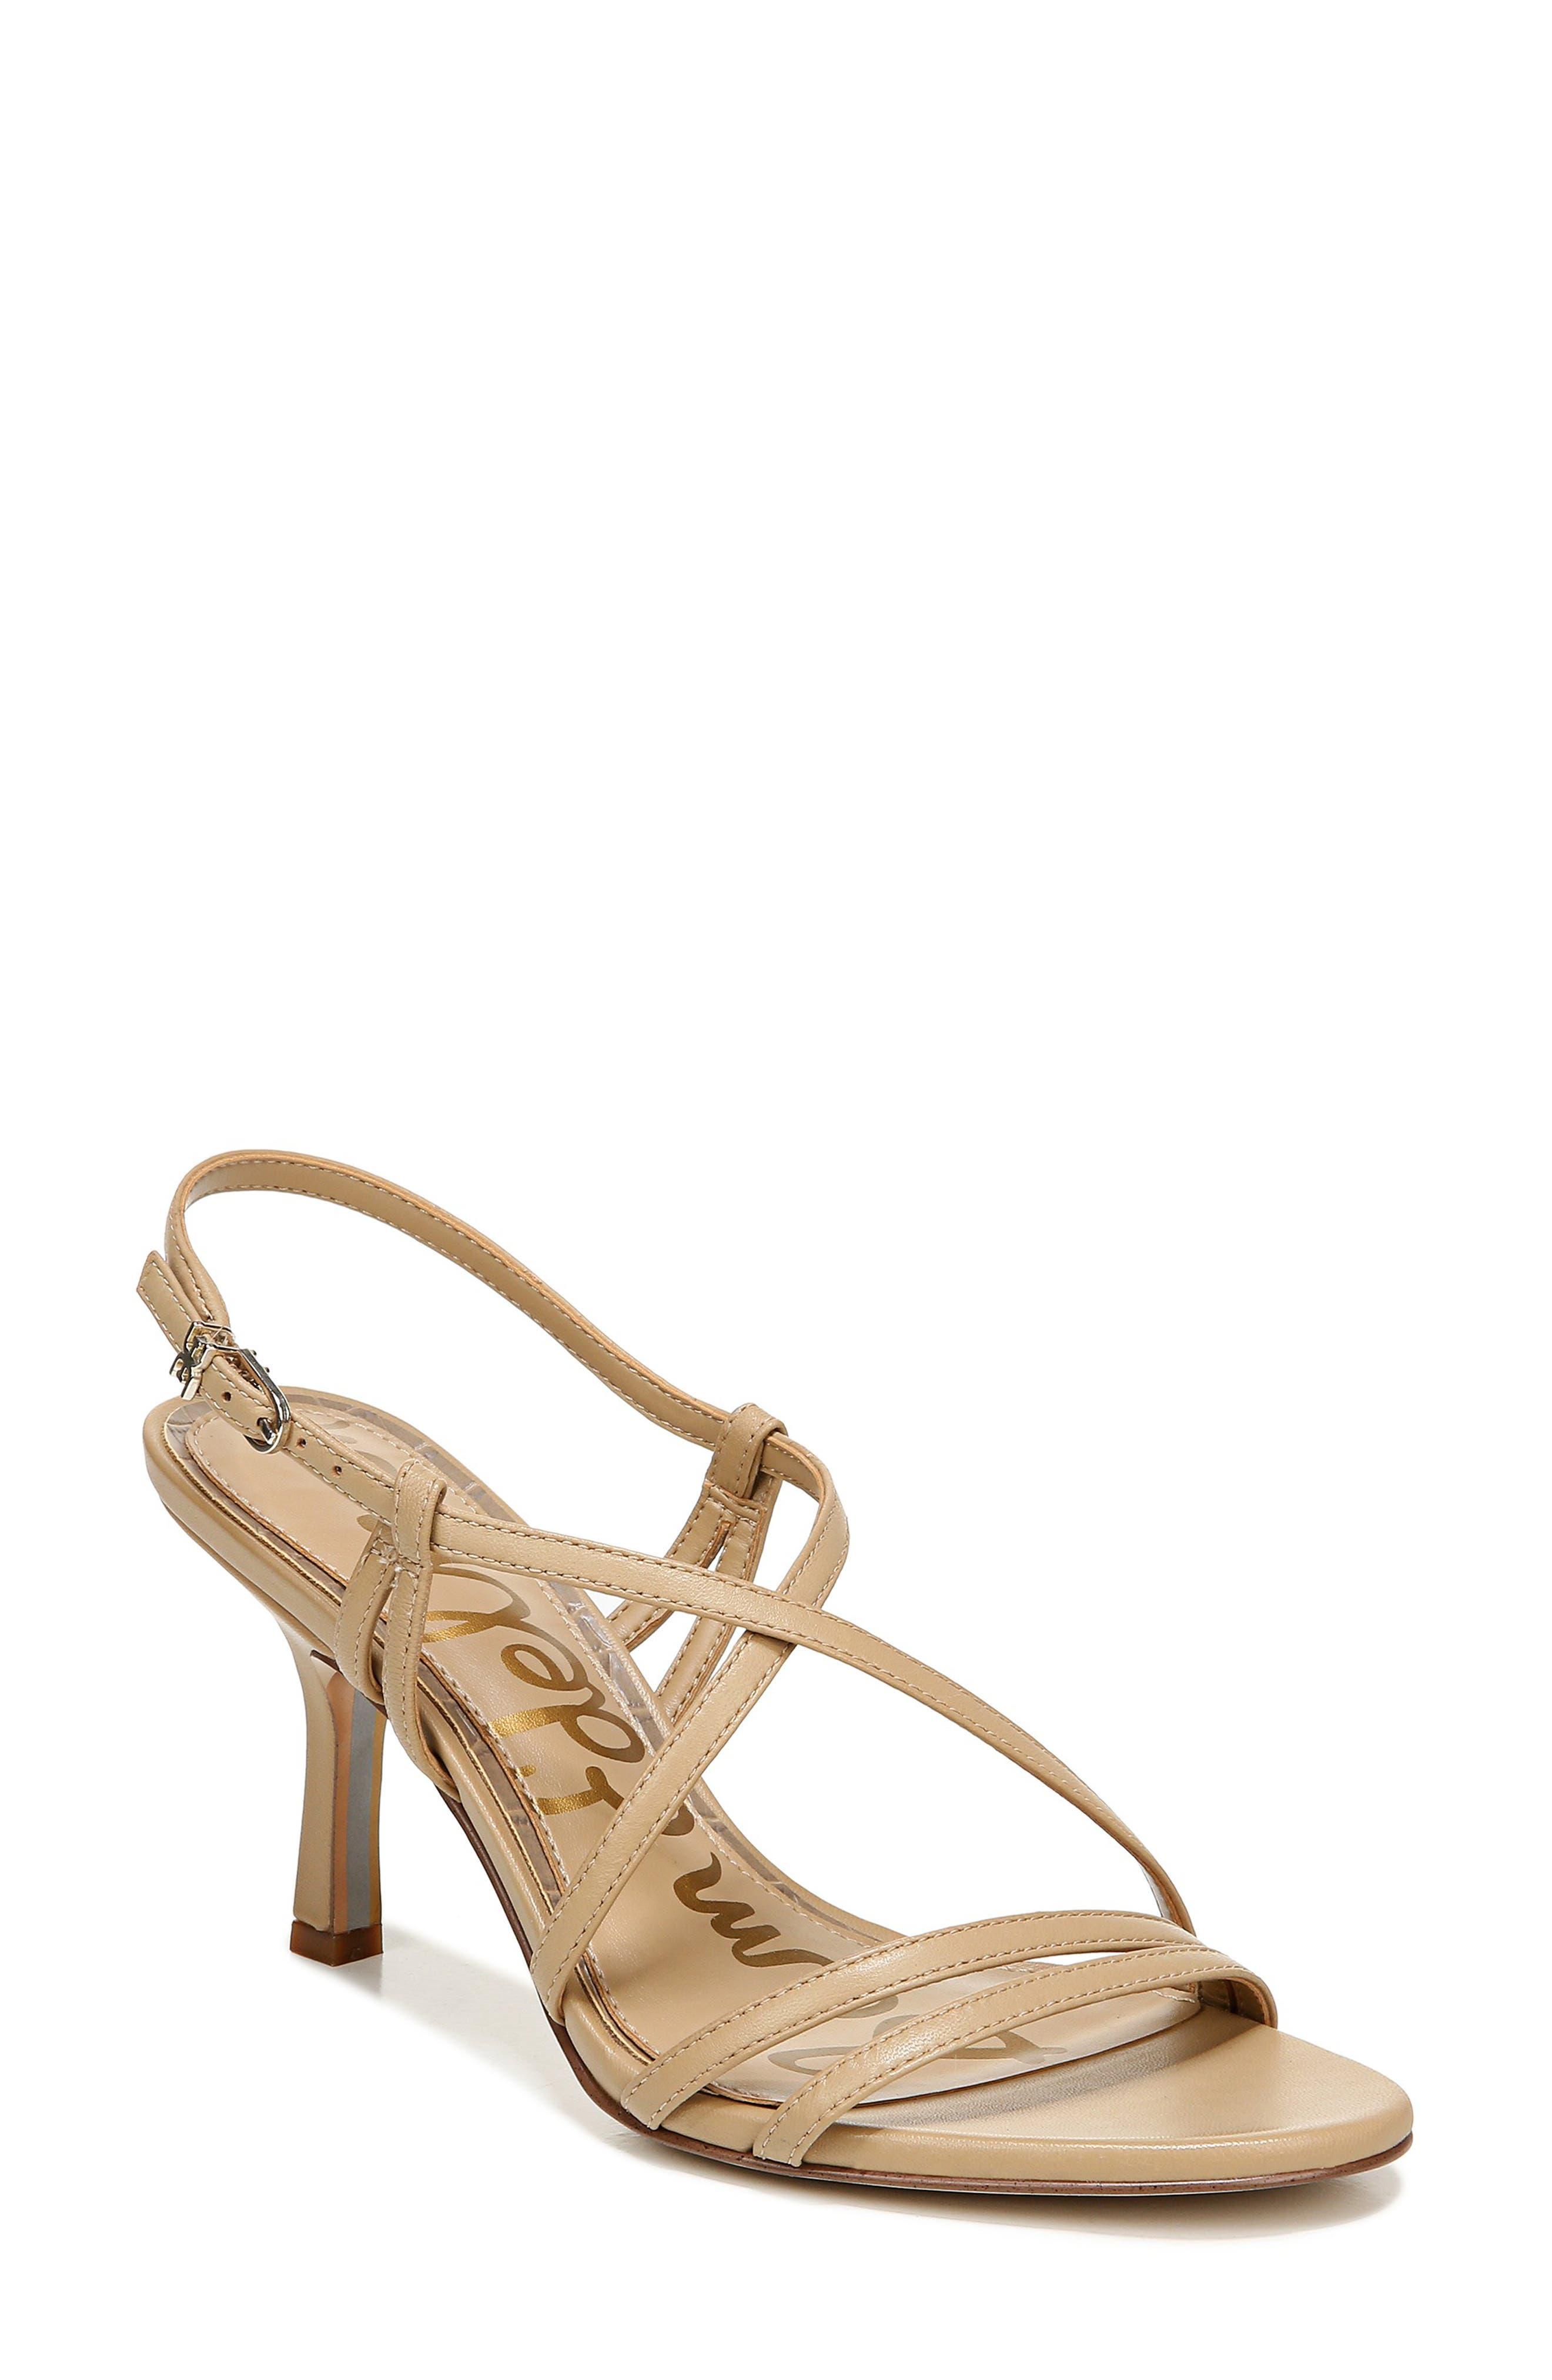 Women s Sam Edelman Paislee Strappy Sandal E5119